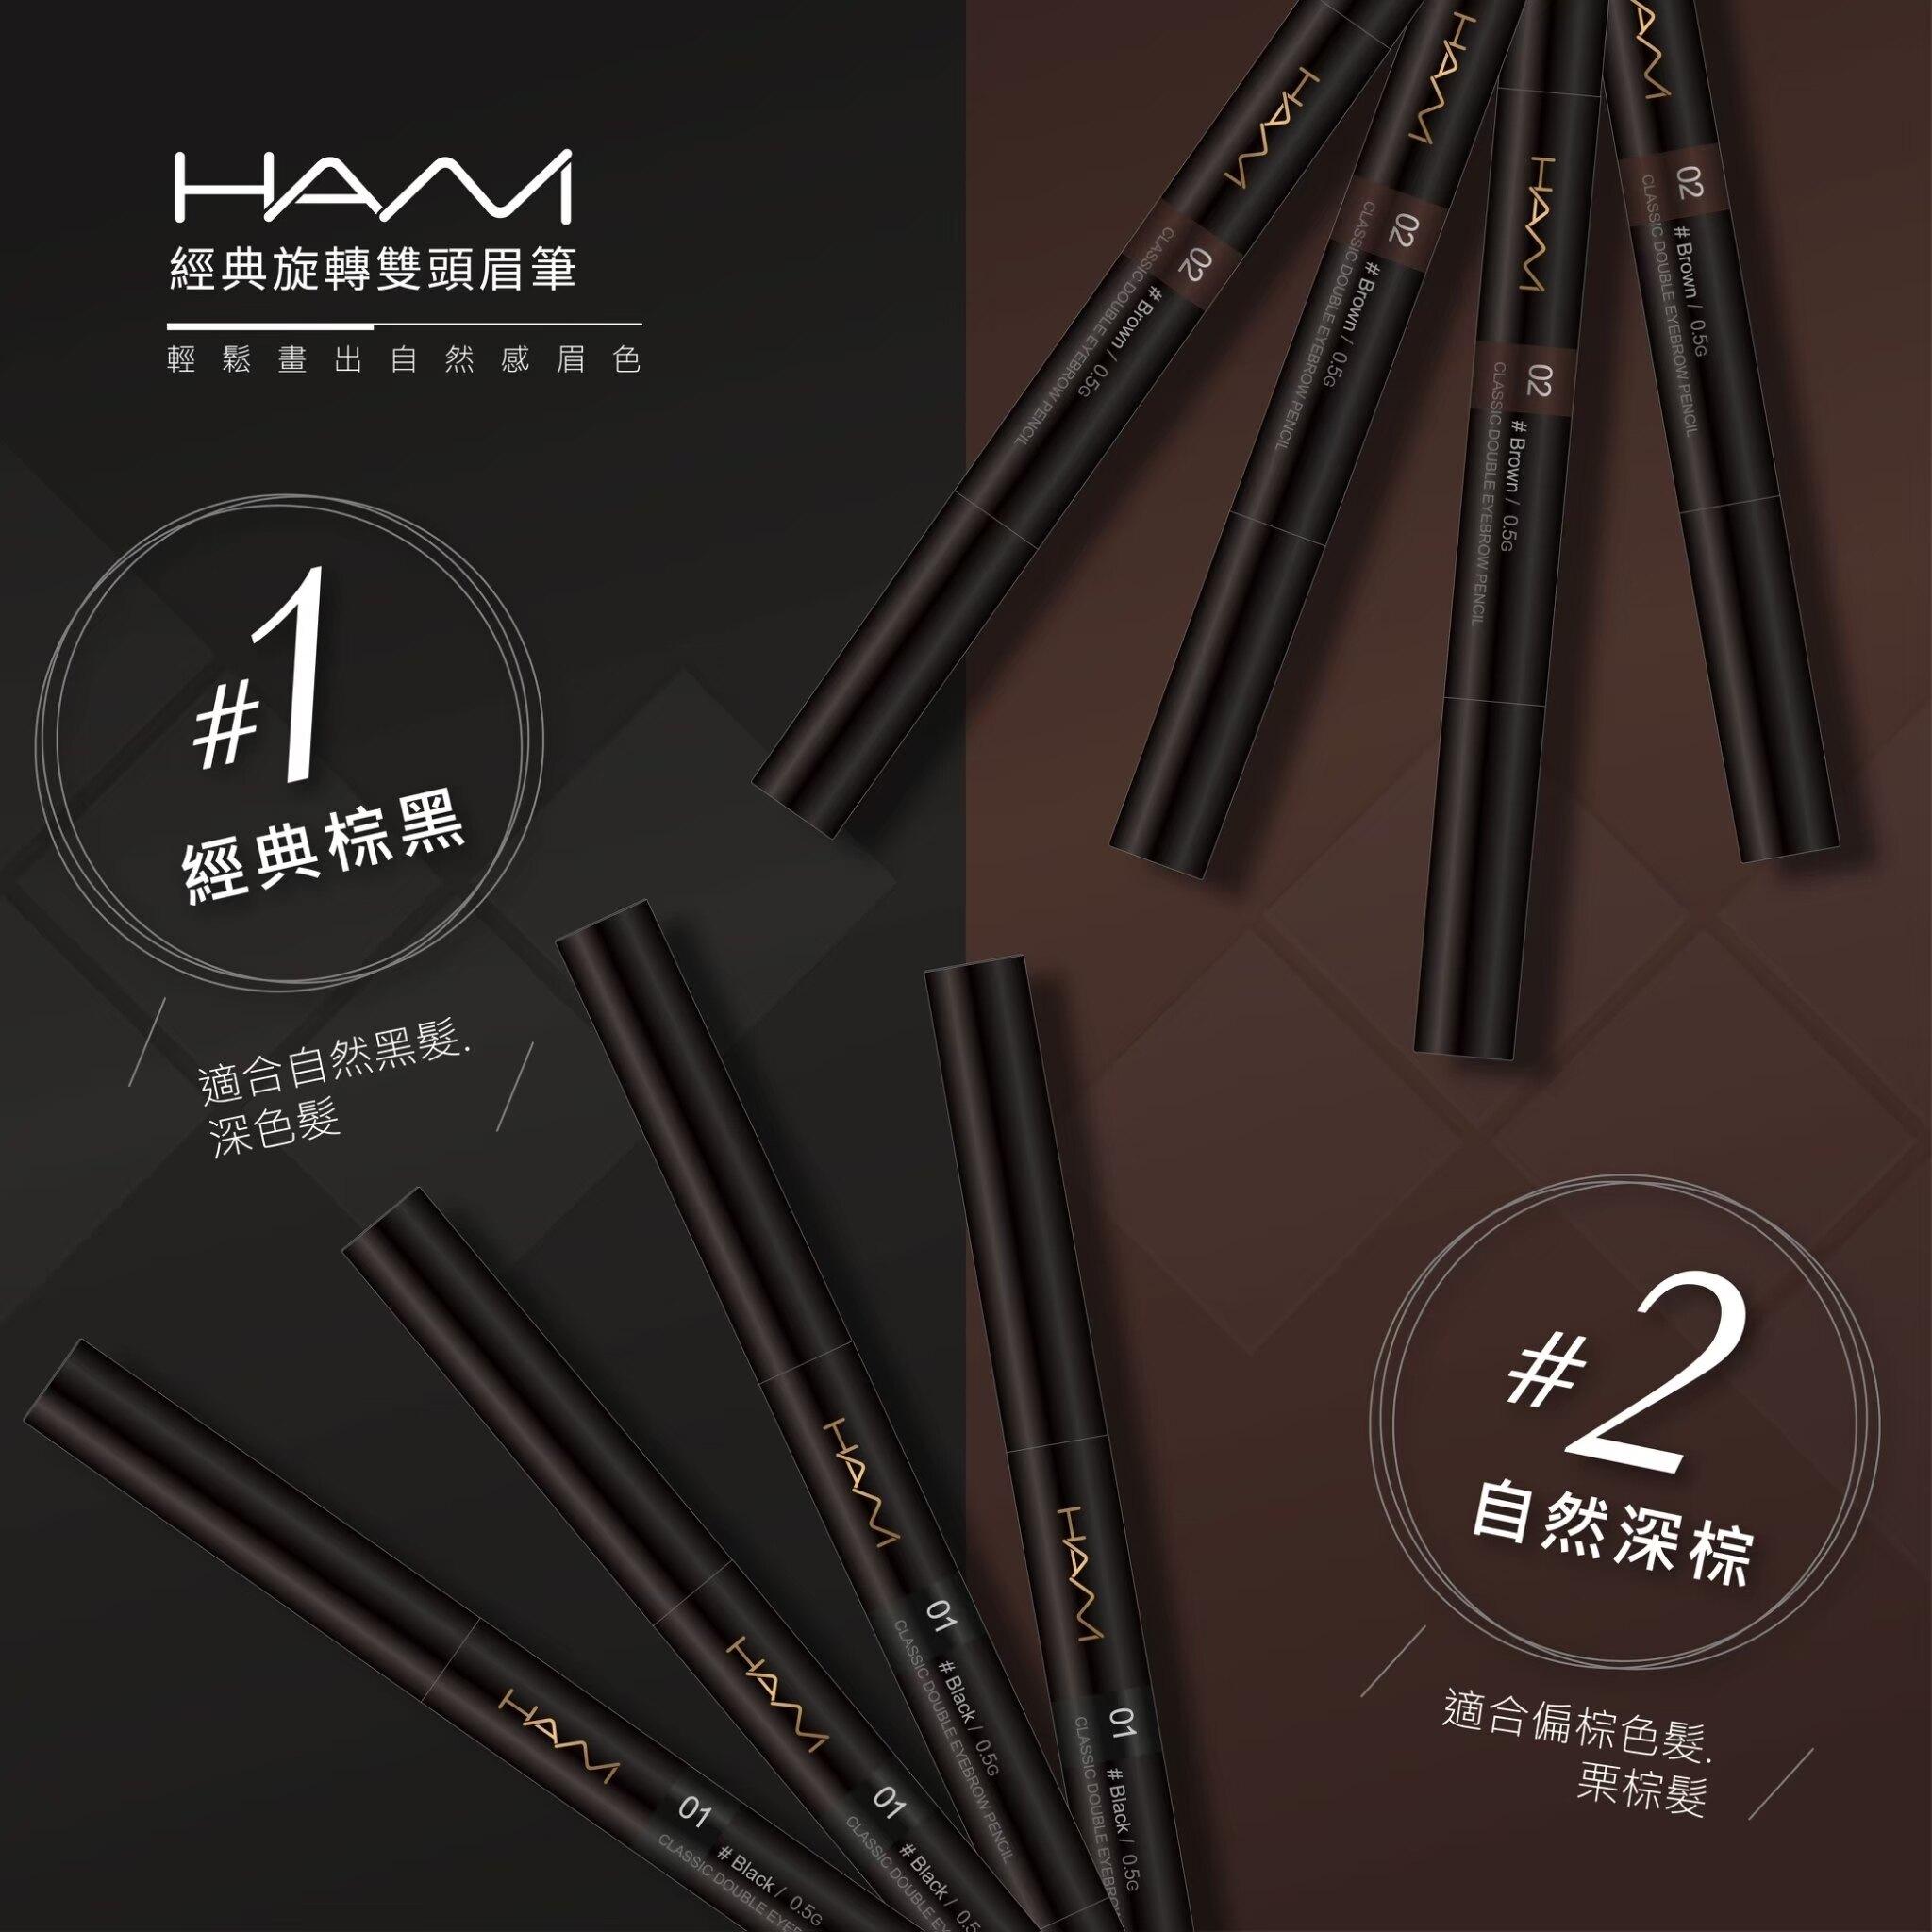 【HANI 】旋轉雙頭眉筆自然深棕/現貨供應